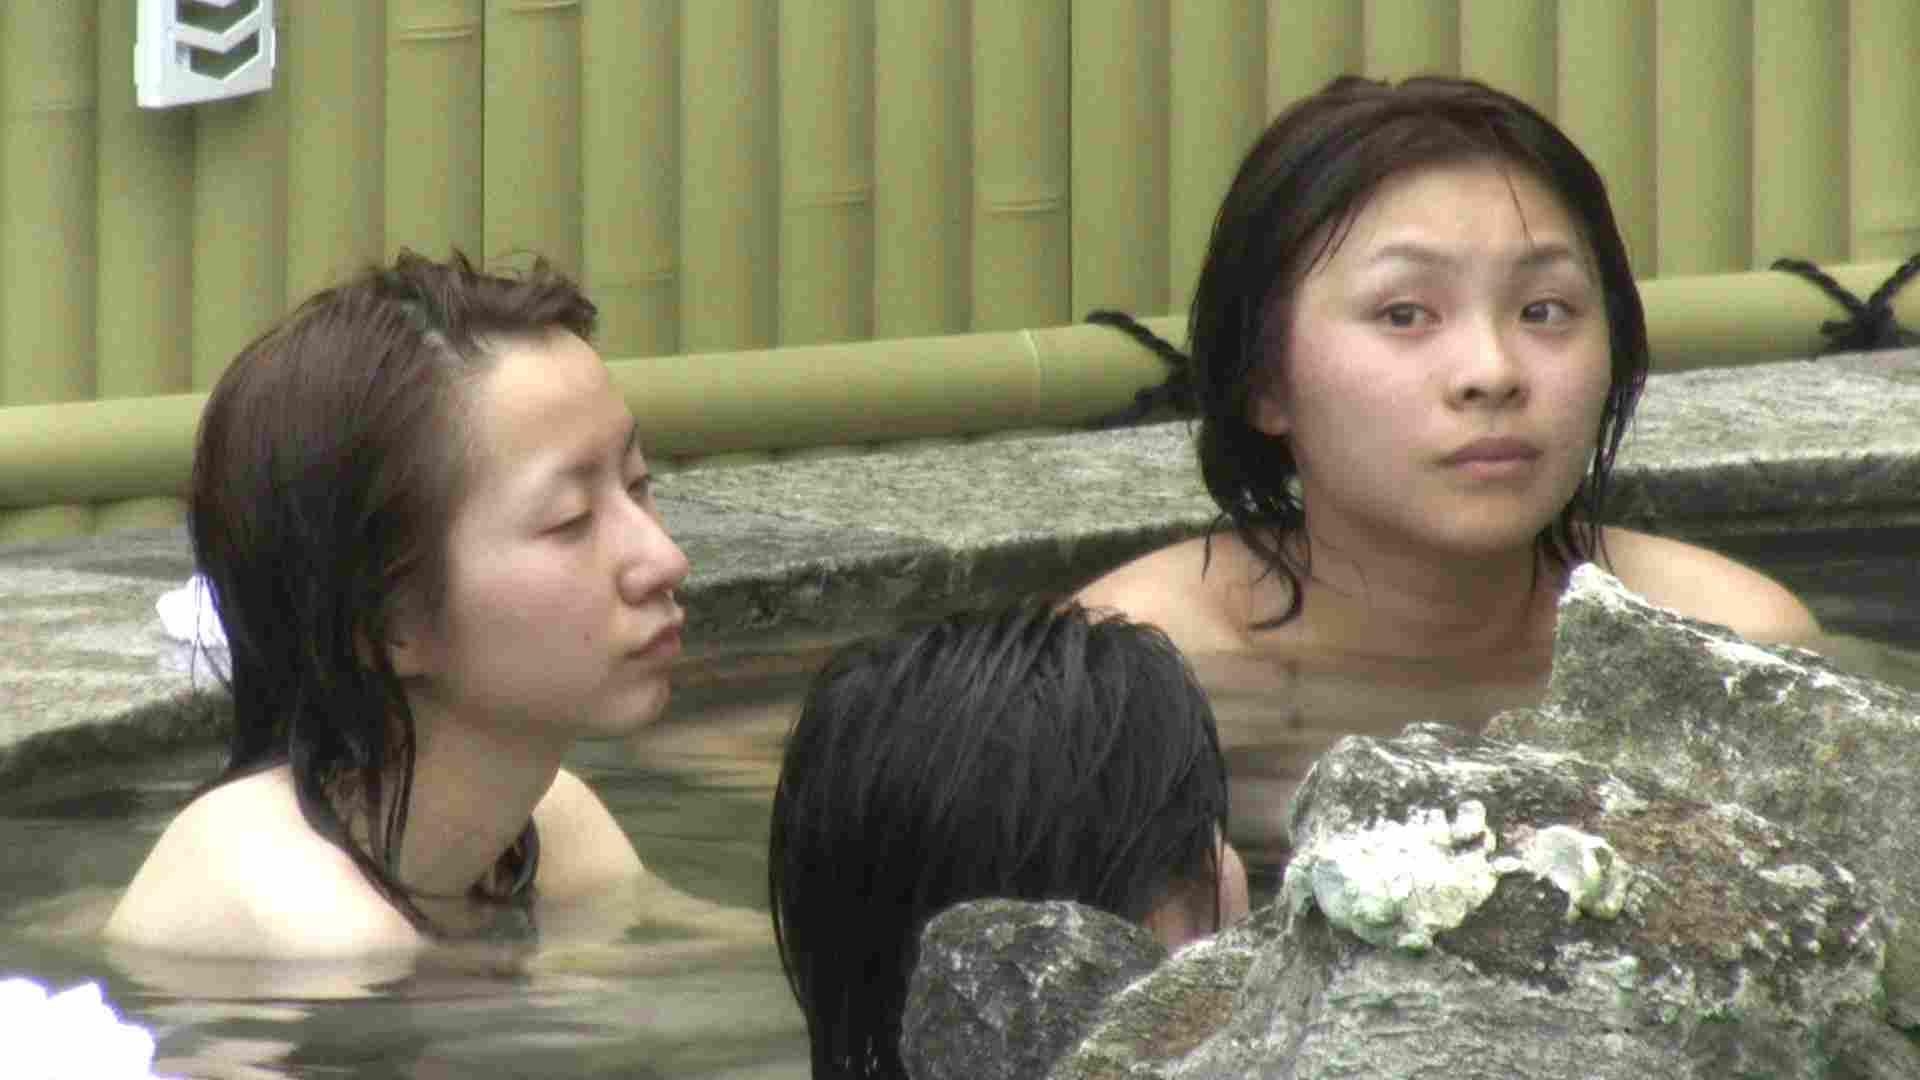 Aquaな露天風呂Vol.181 OLのエロ生活 | 露天風呂  40連発 28